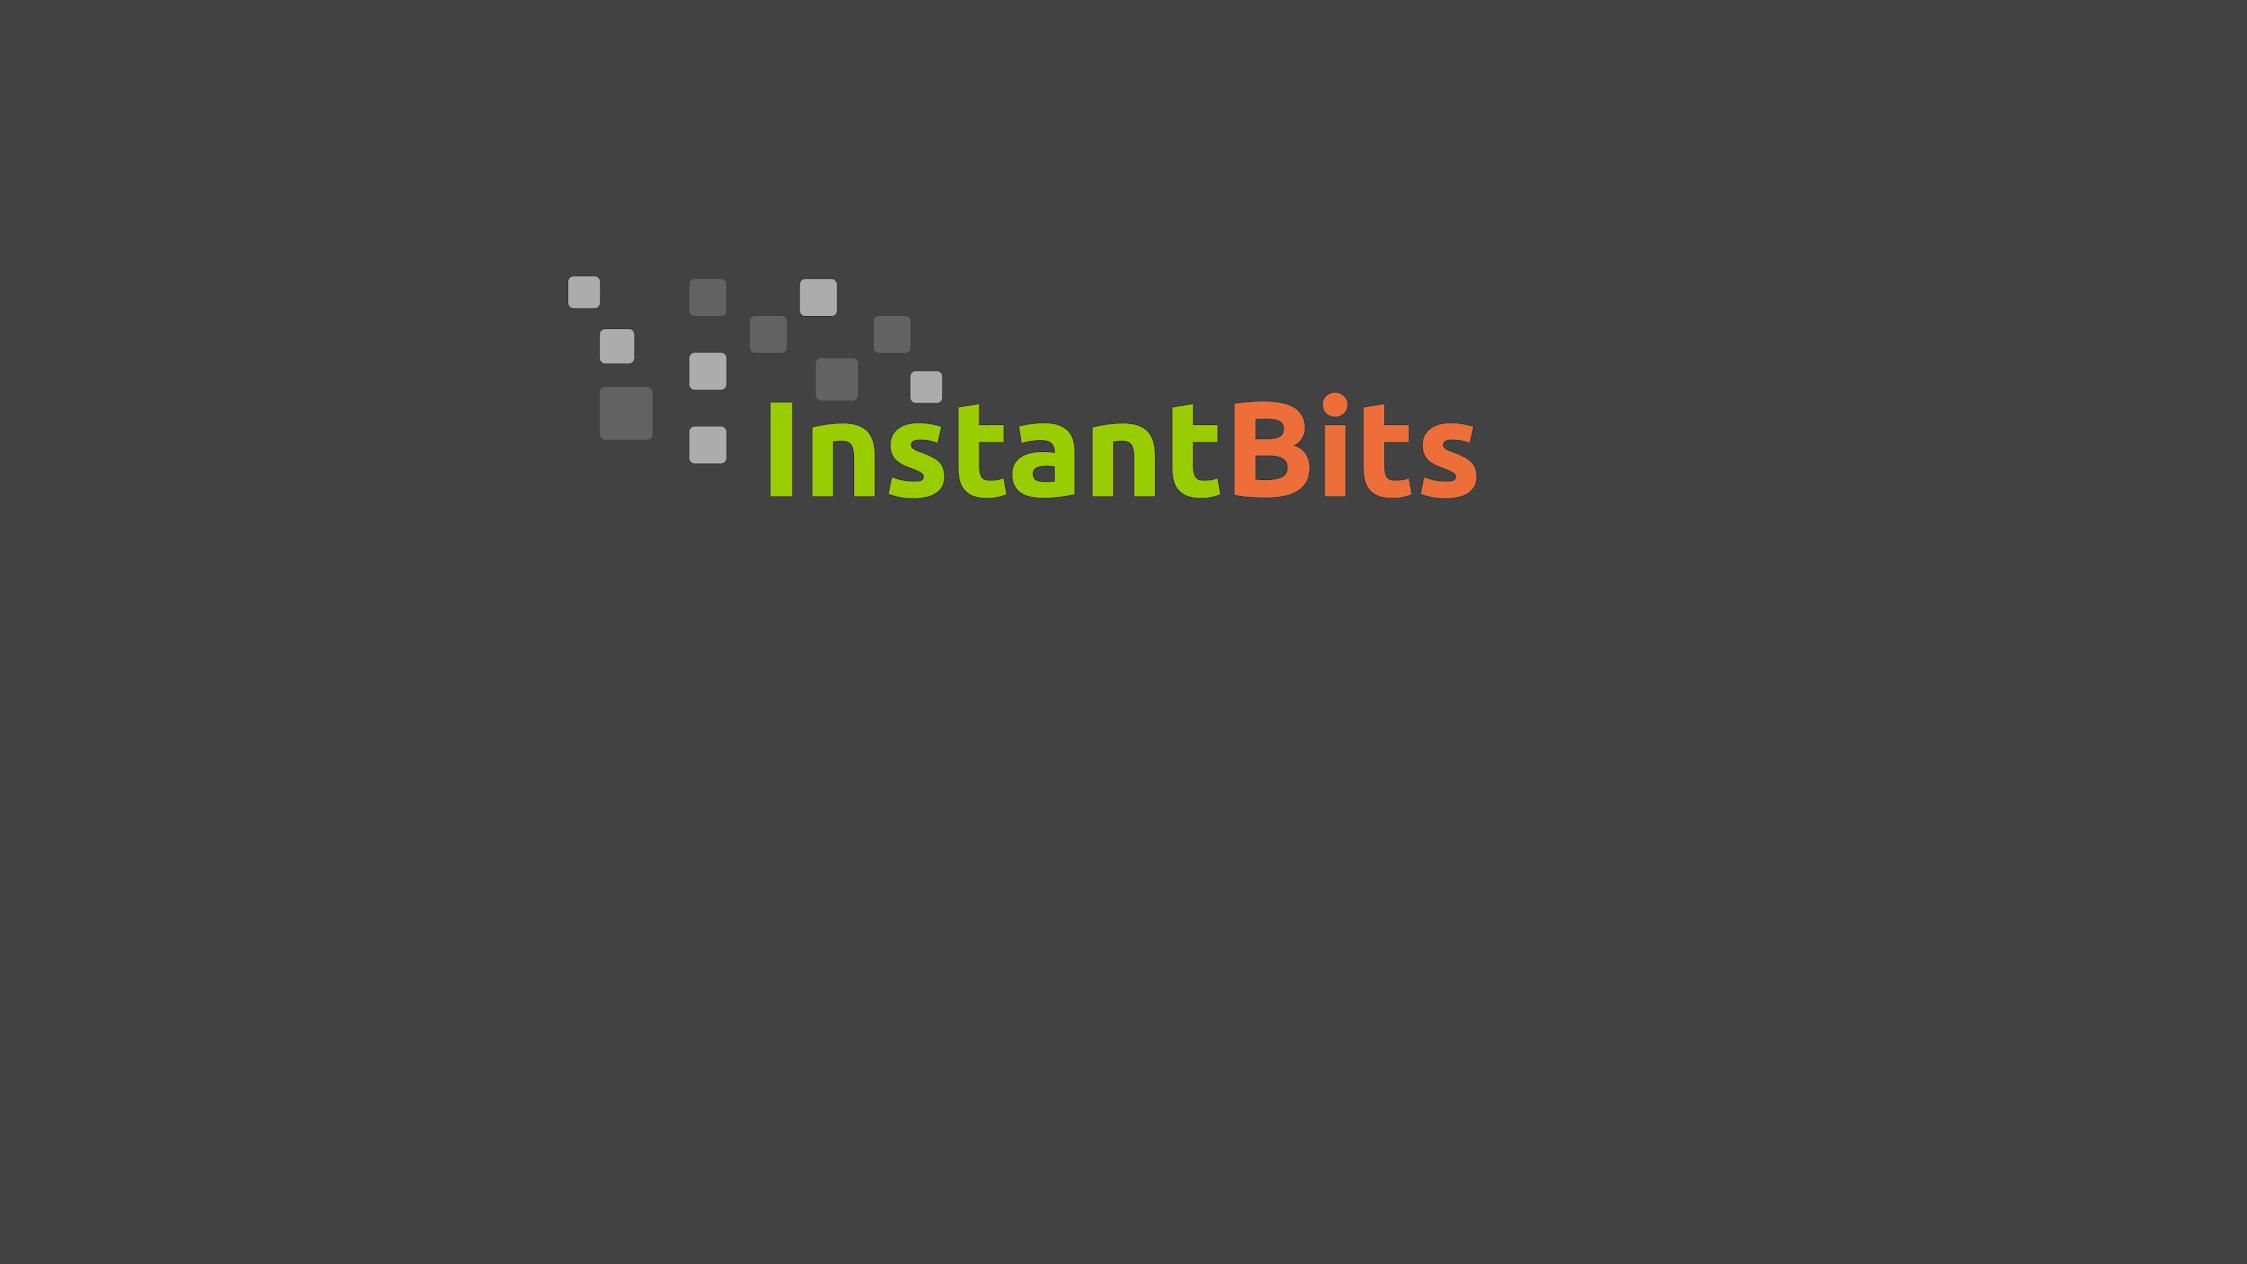 InstantBits Inc